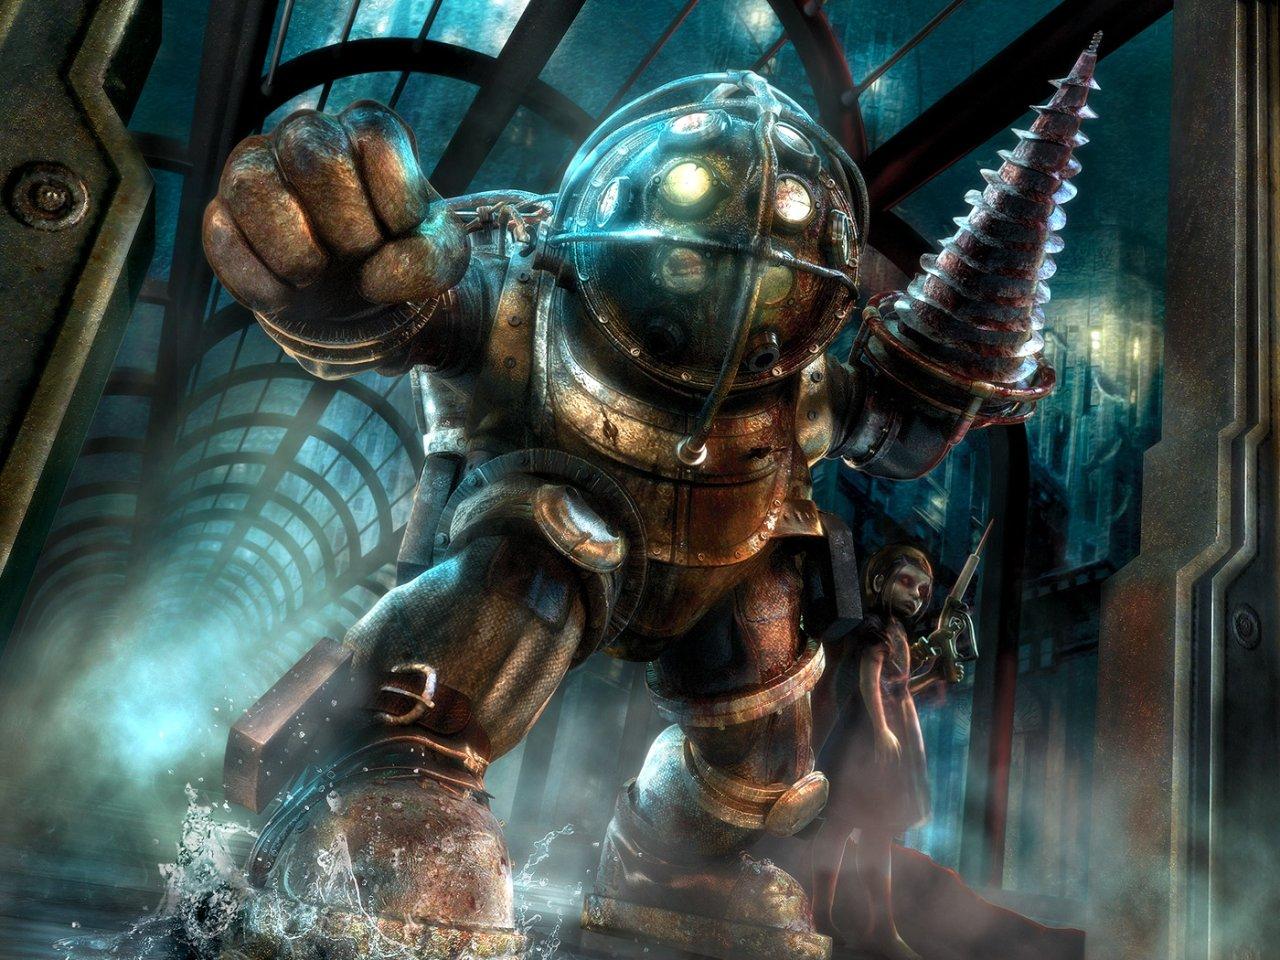 No <i>BioShock</i> Movie Happening, Says Game's Creator